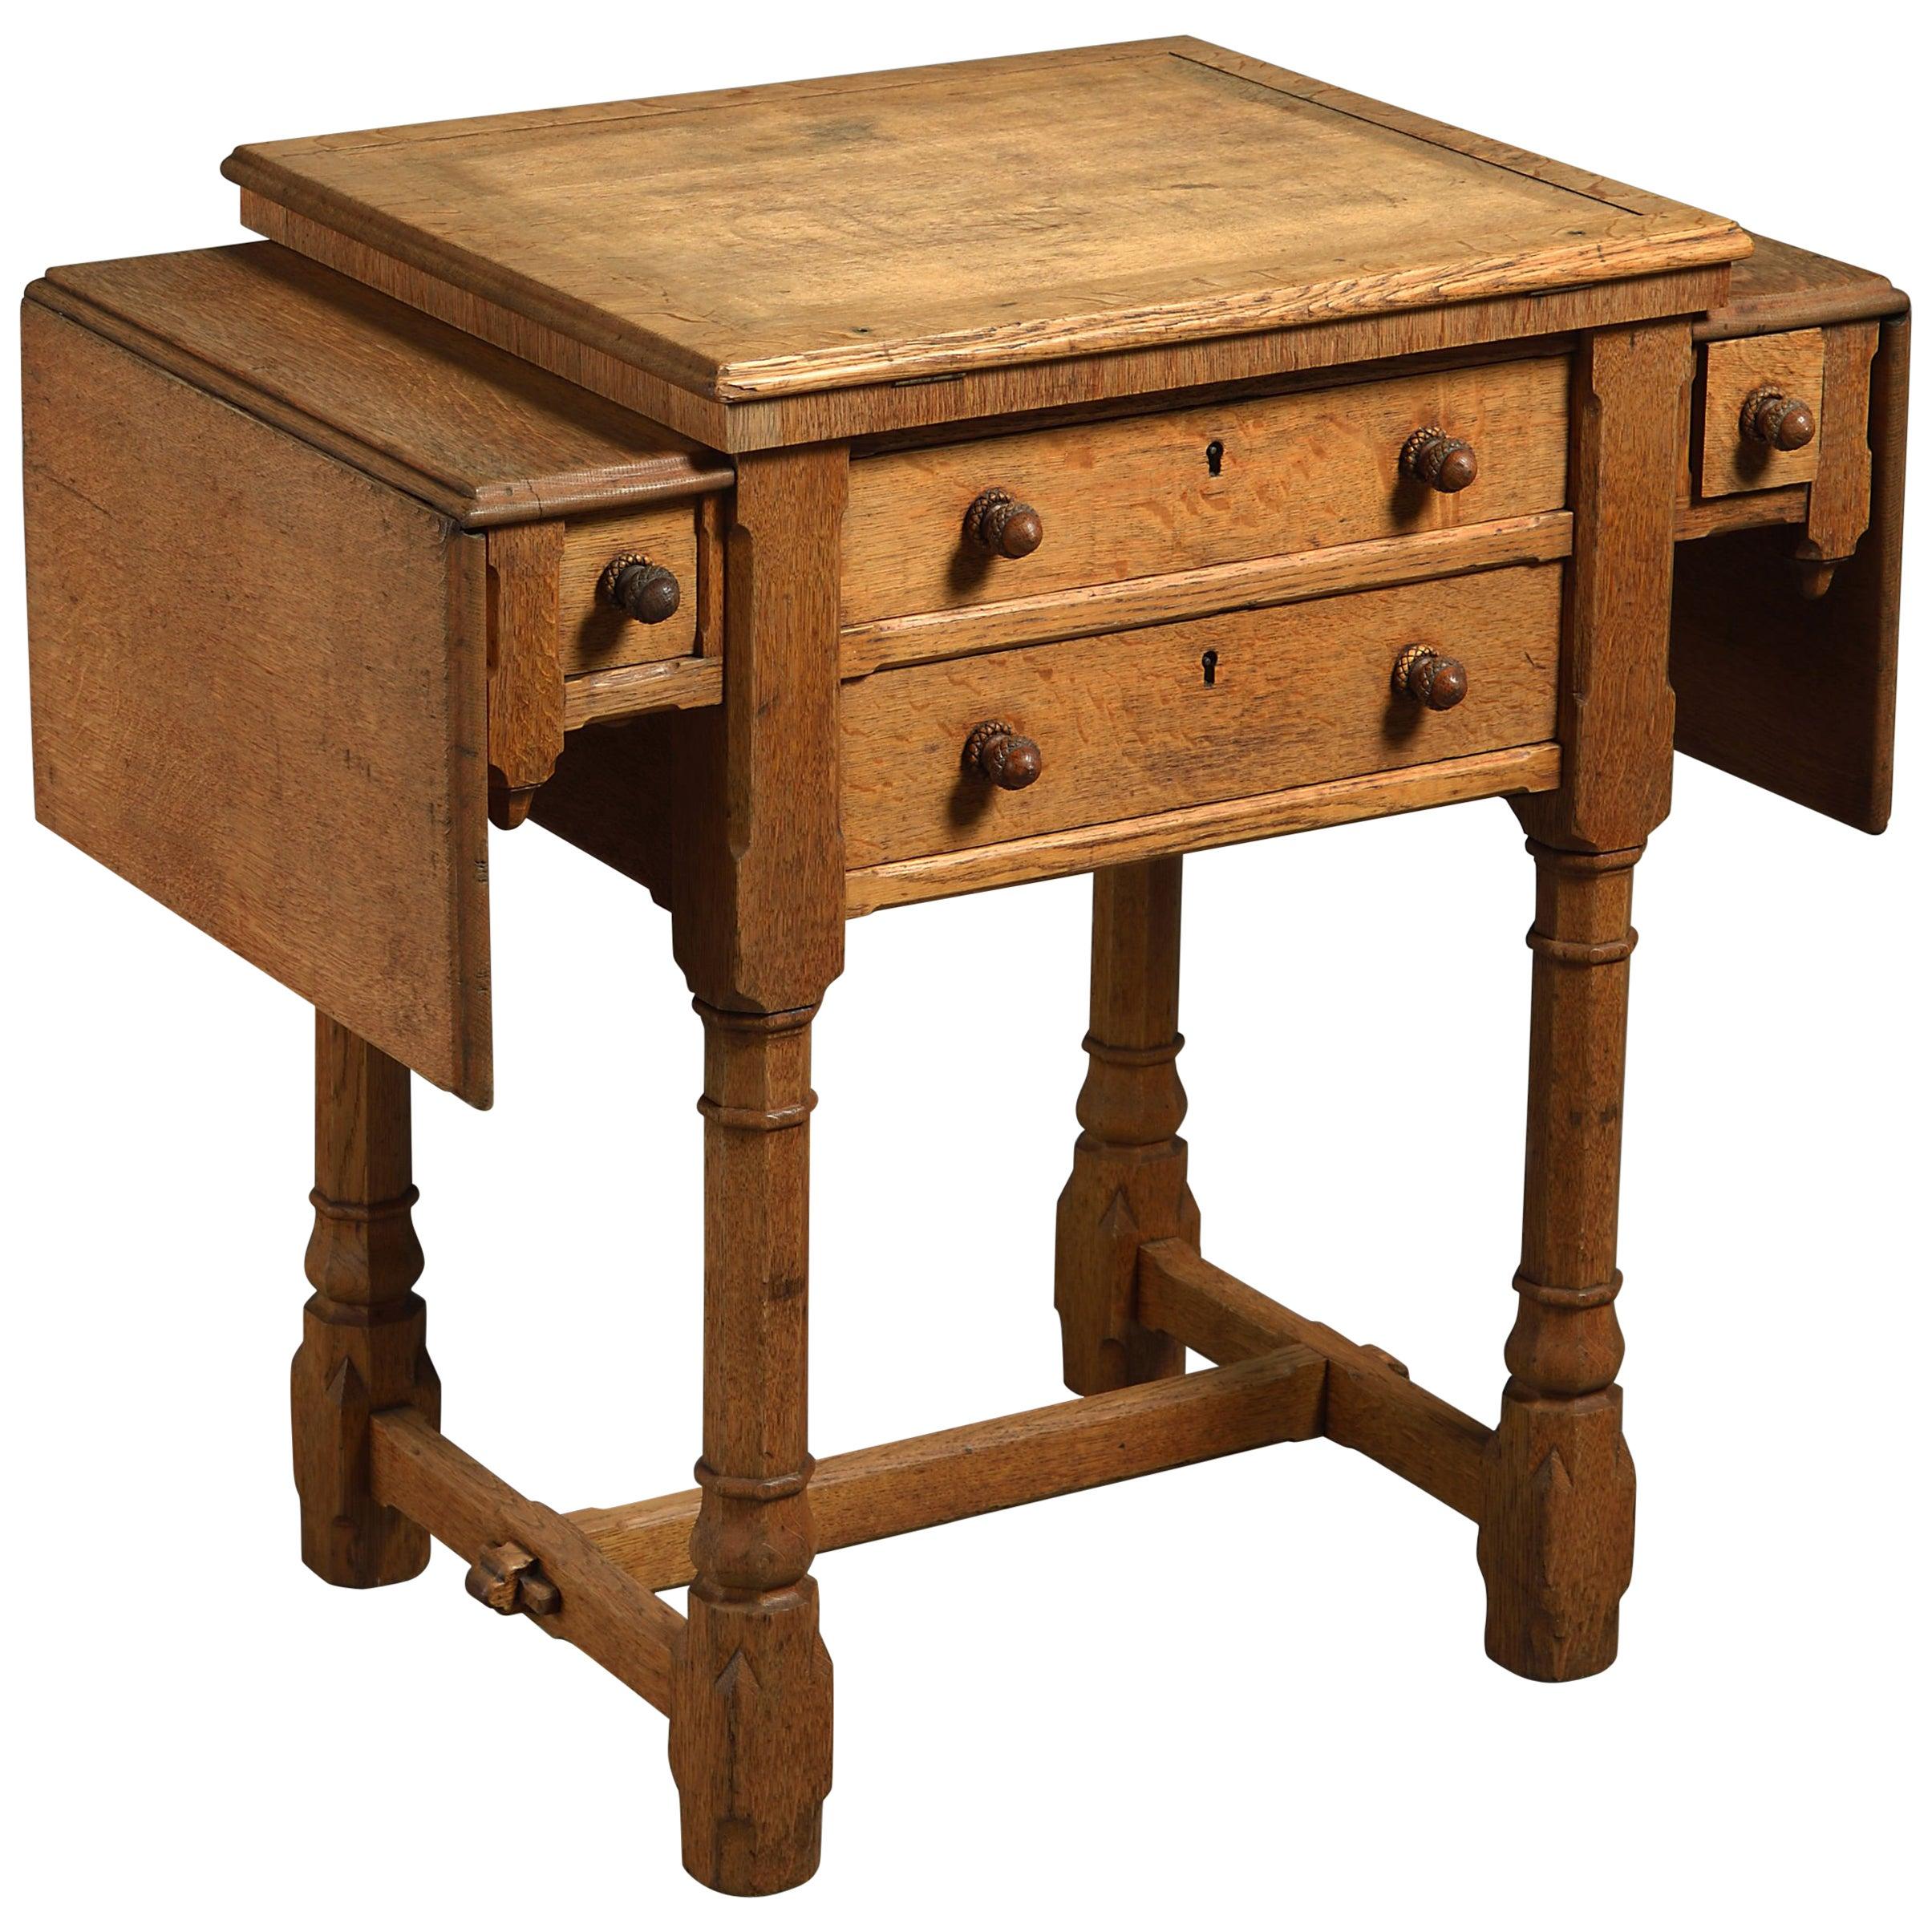 19th Century Gillows Metamorphic Oak Work Table